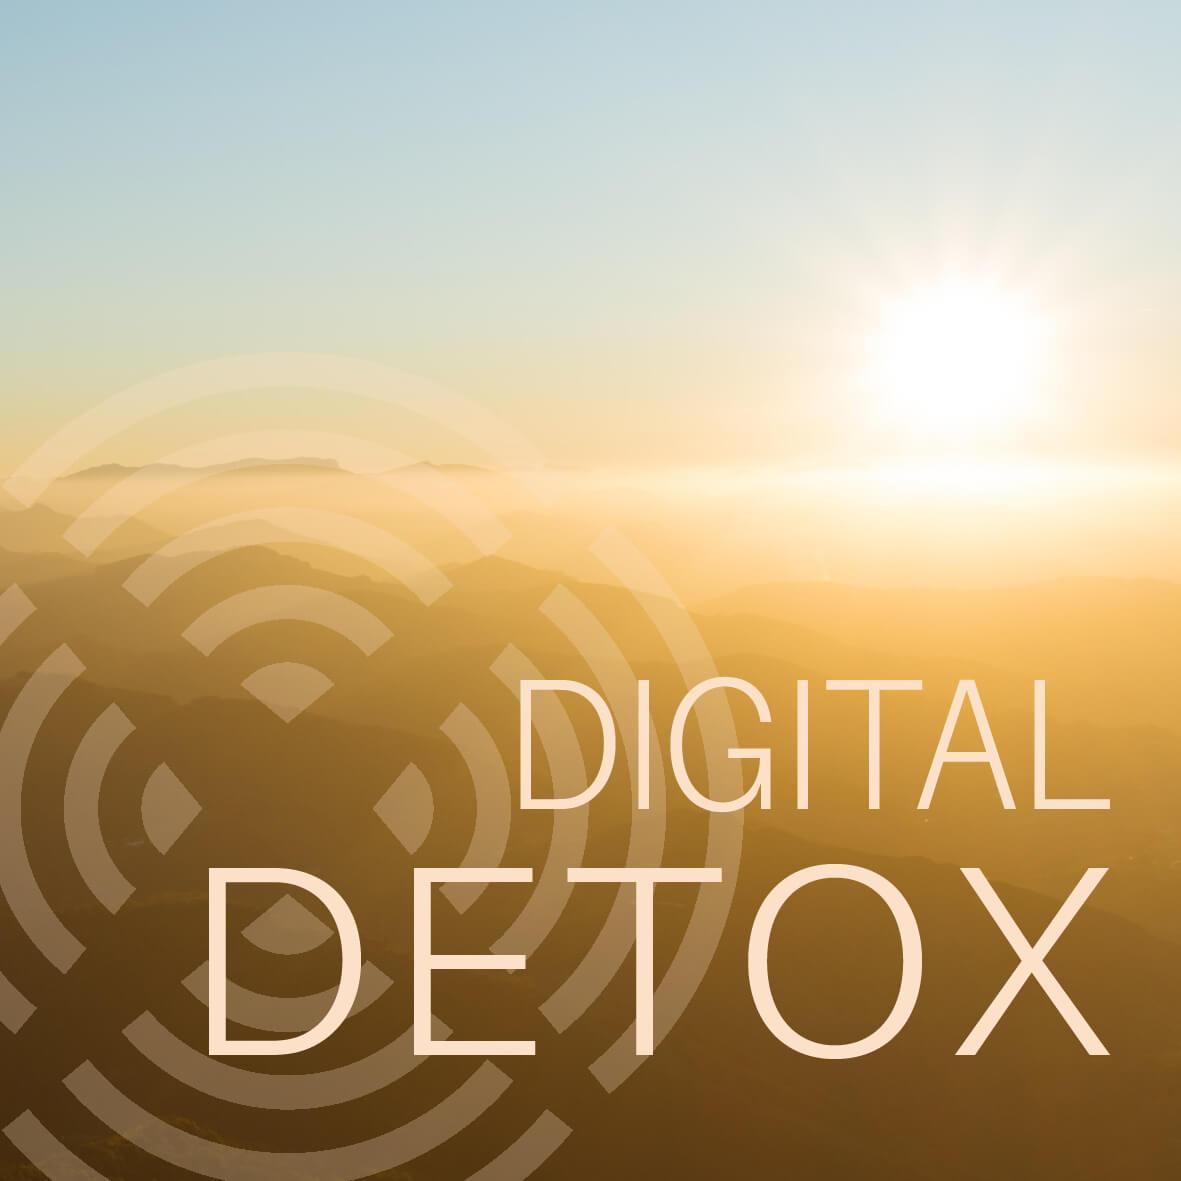 Box Digital detox